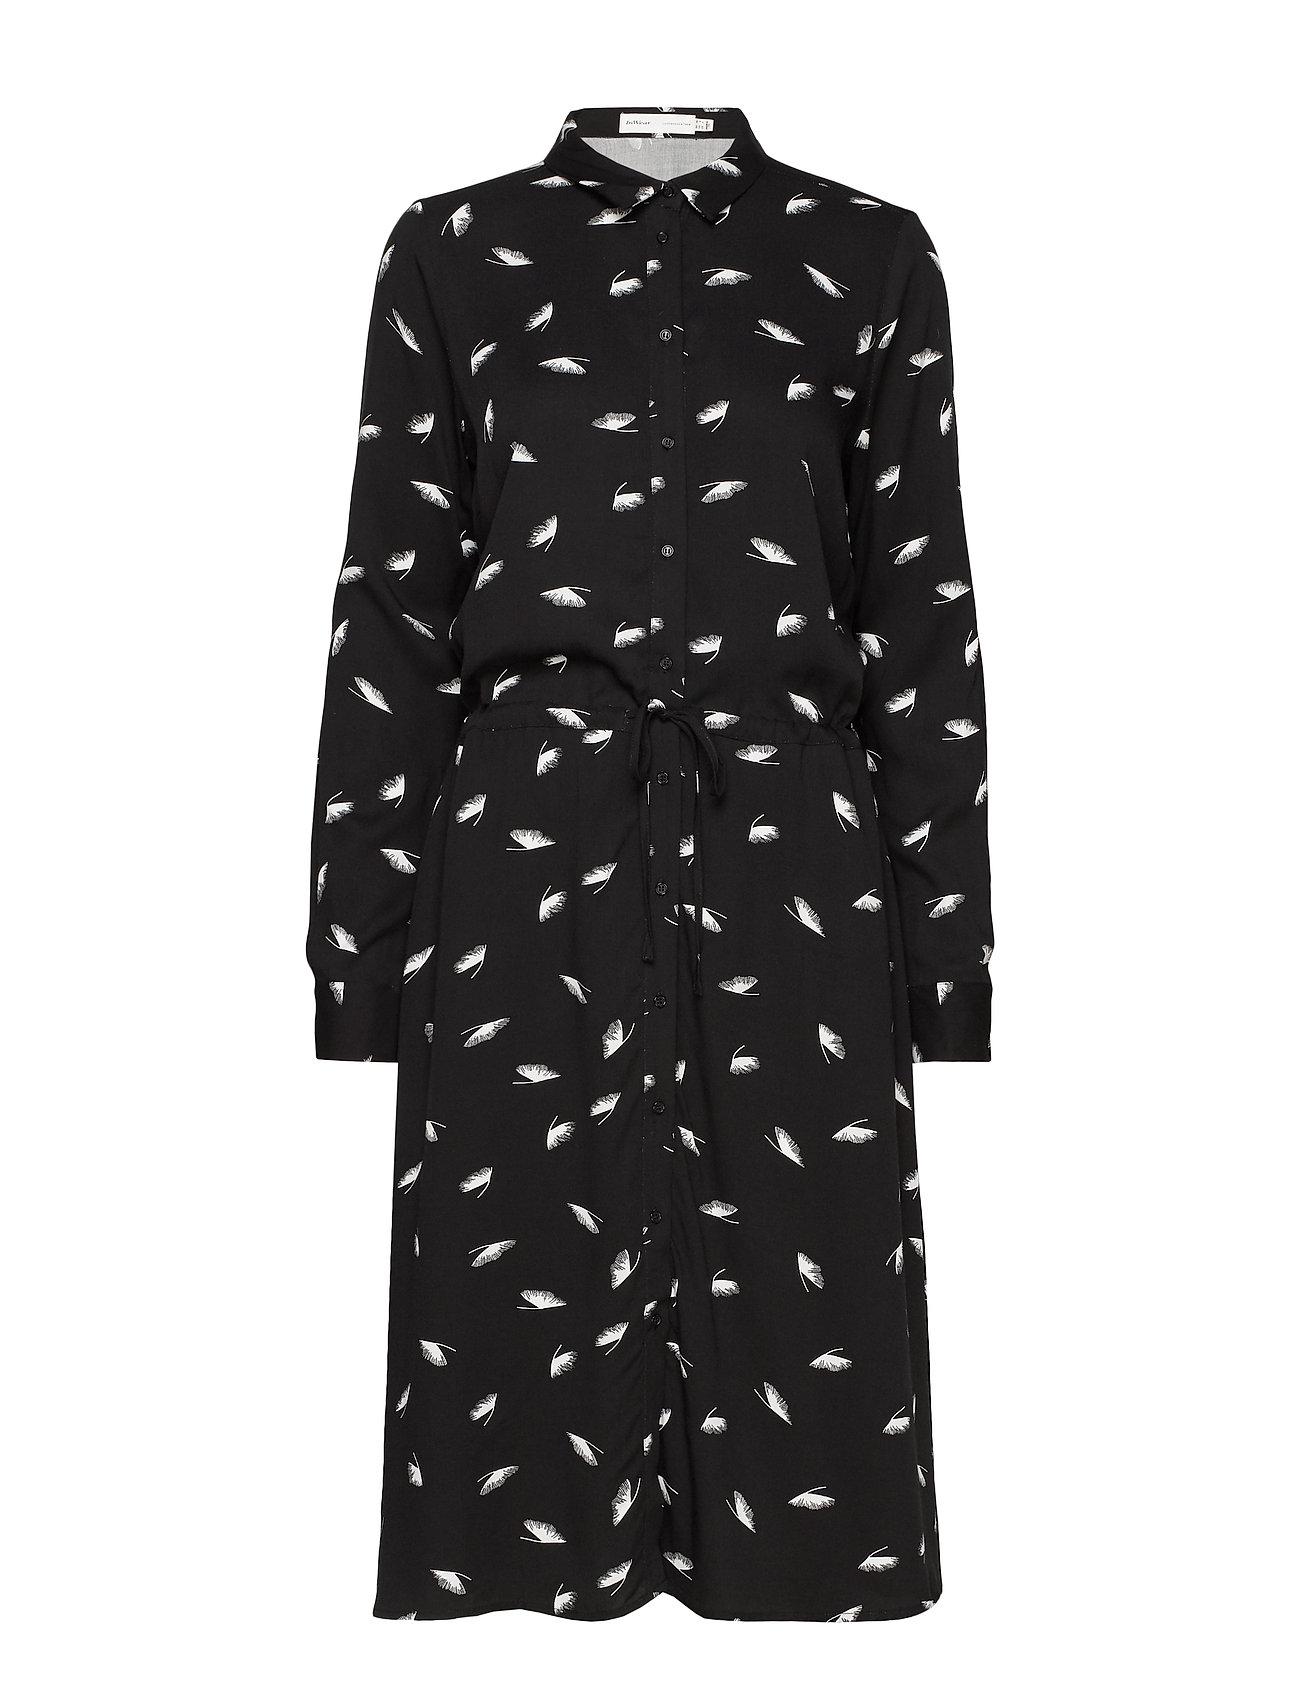 InWear KristinaIW Dress - BLACK GINKO LEAVES